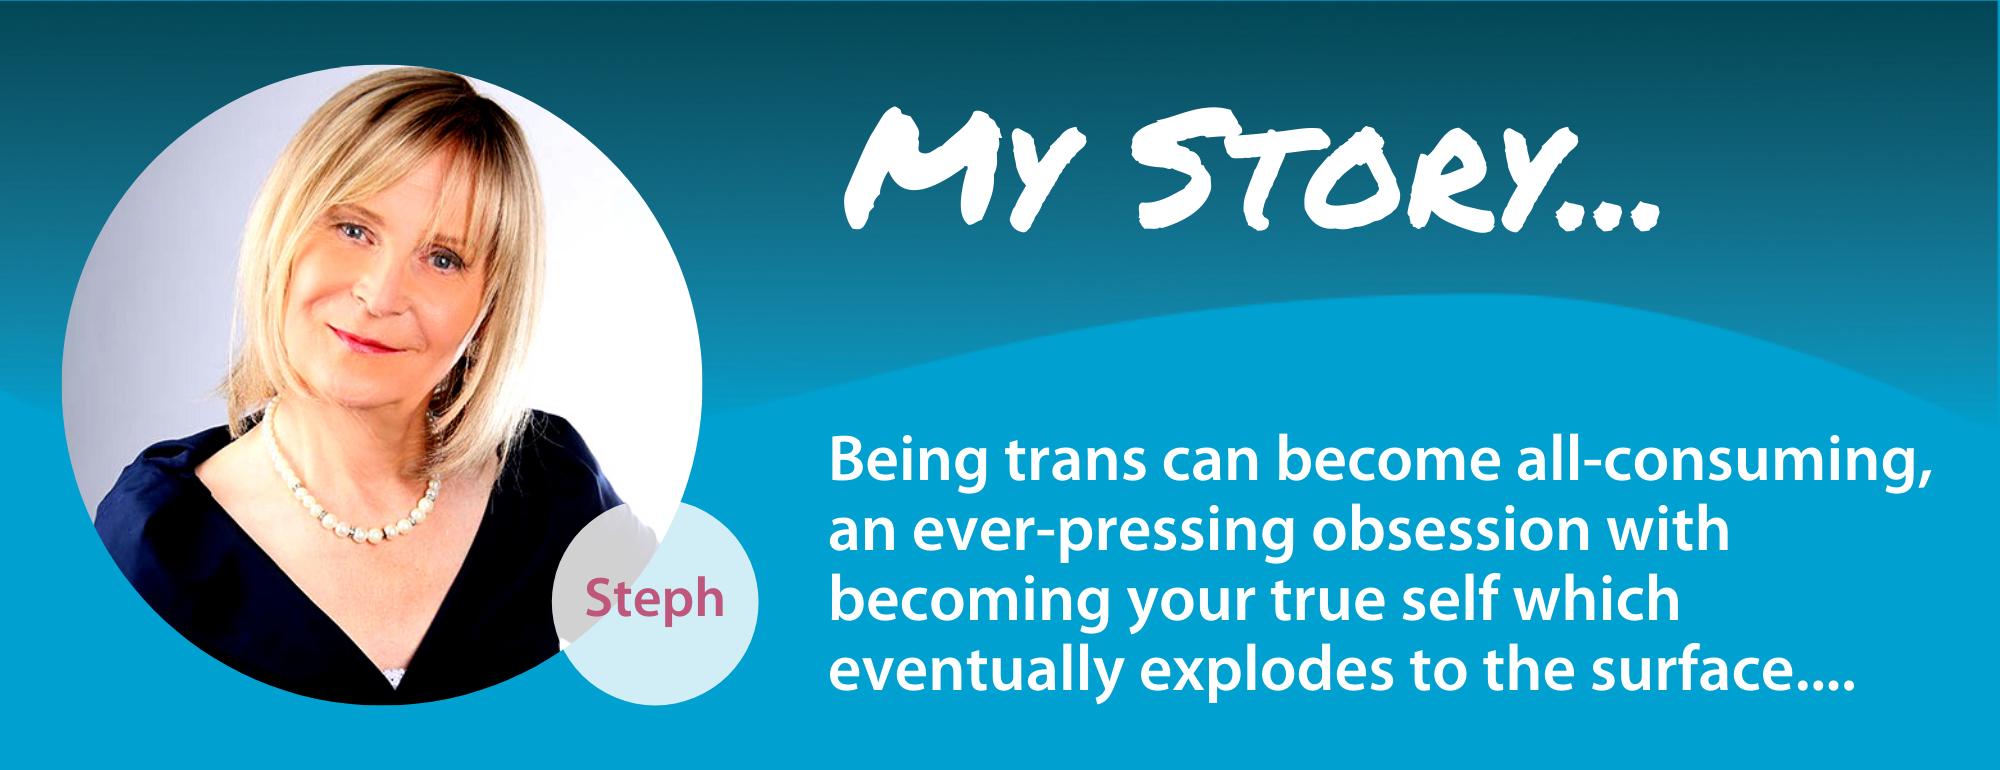 My Story - Steph - GenderGP - Header